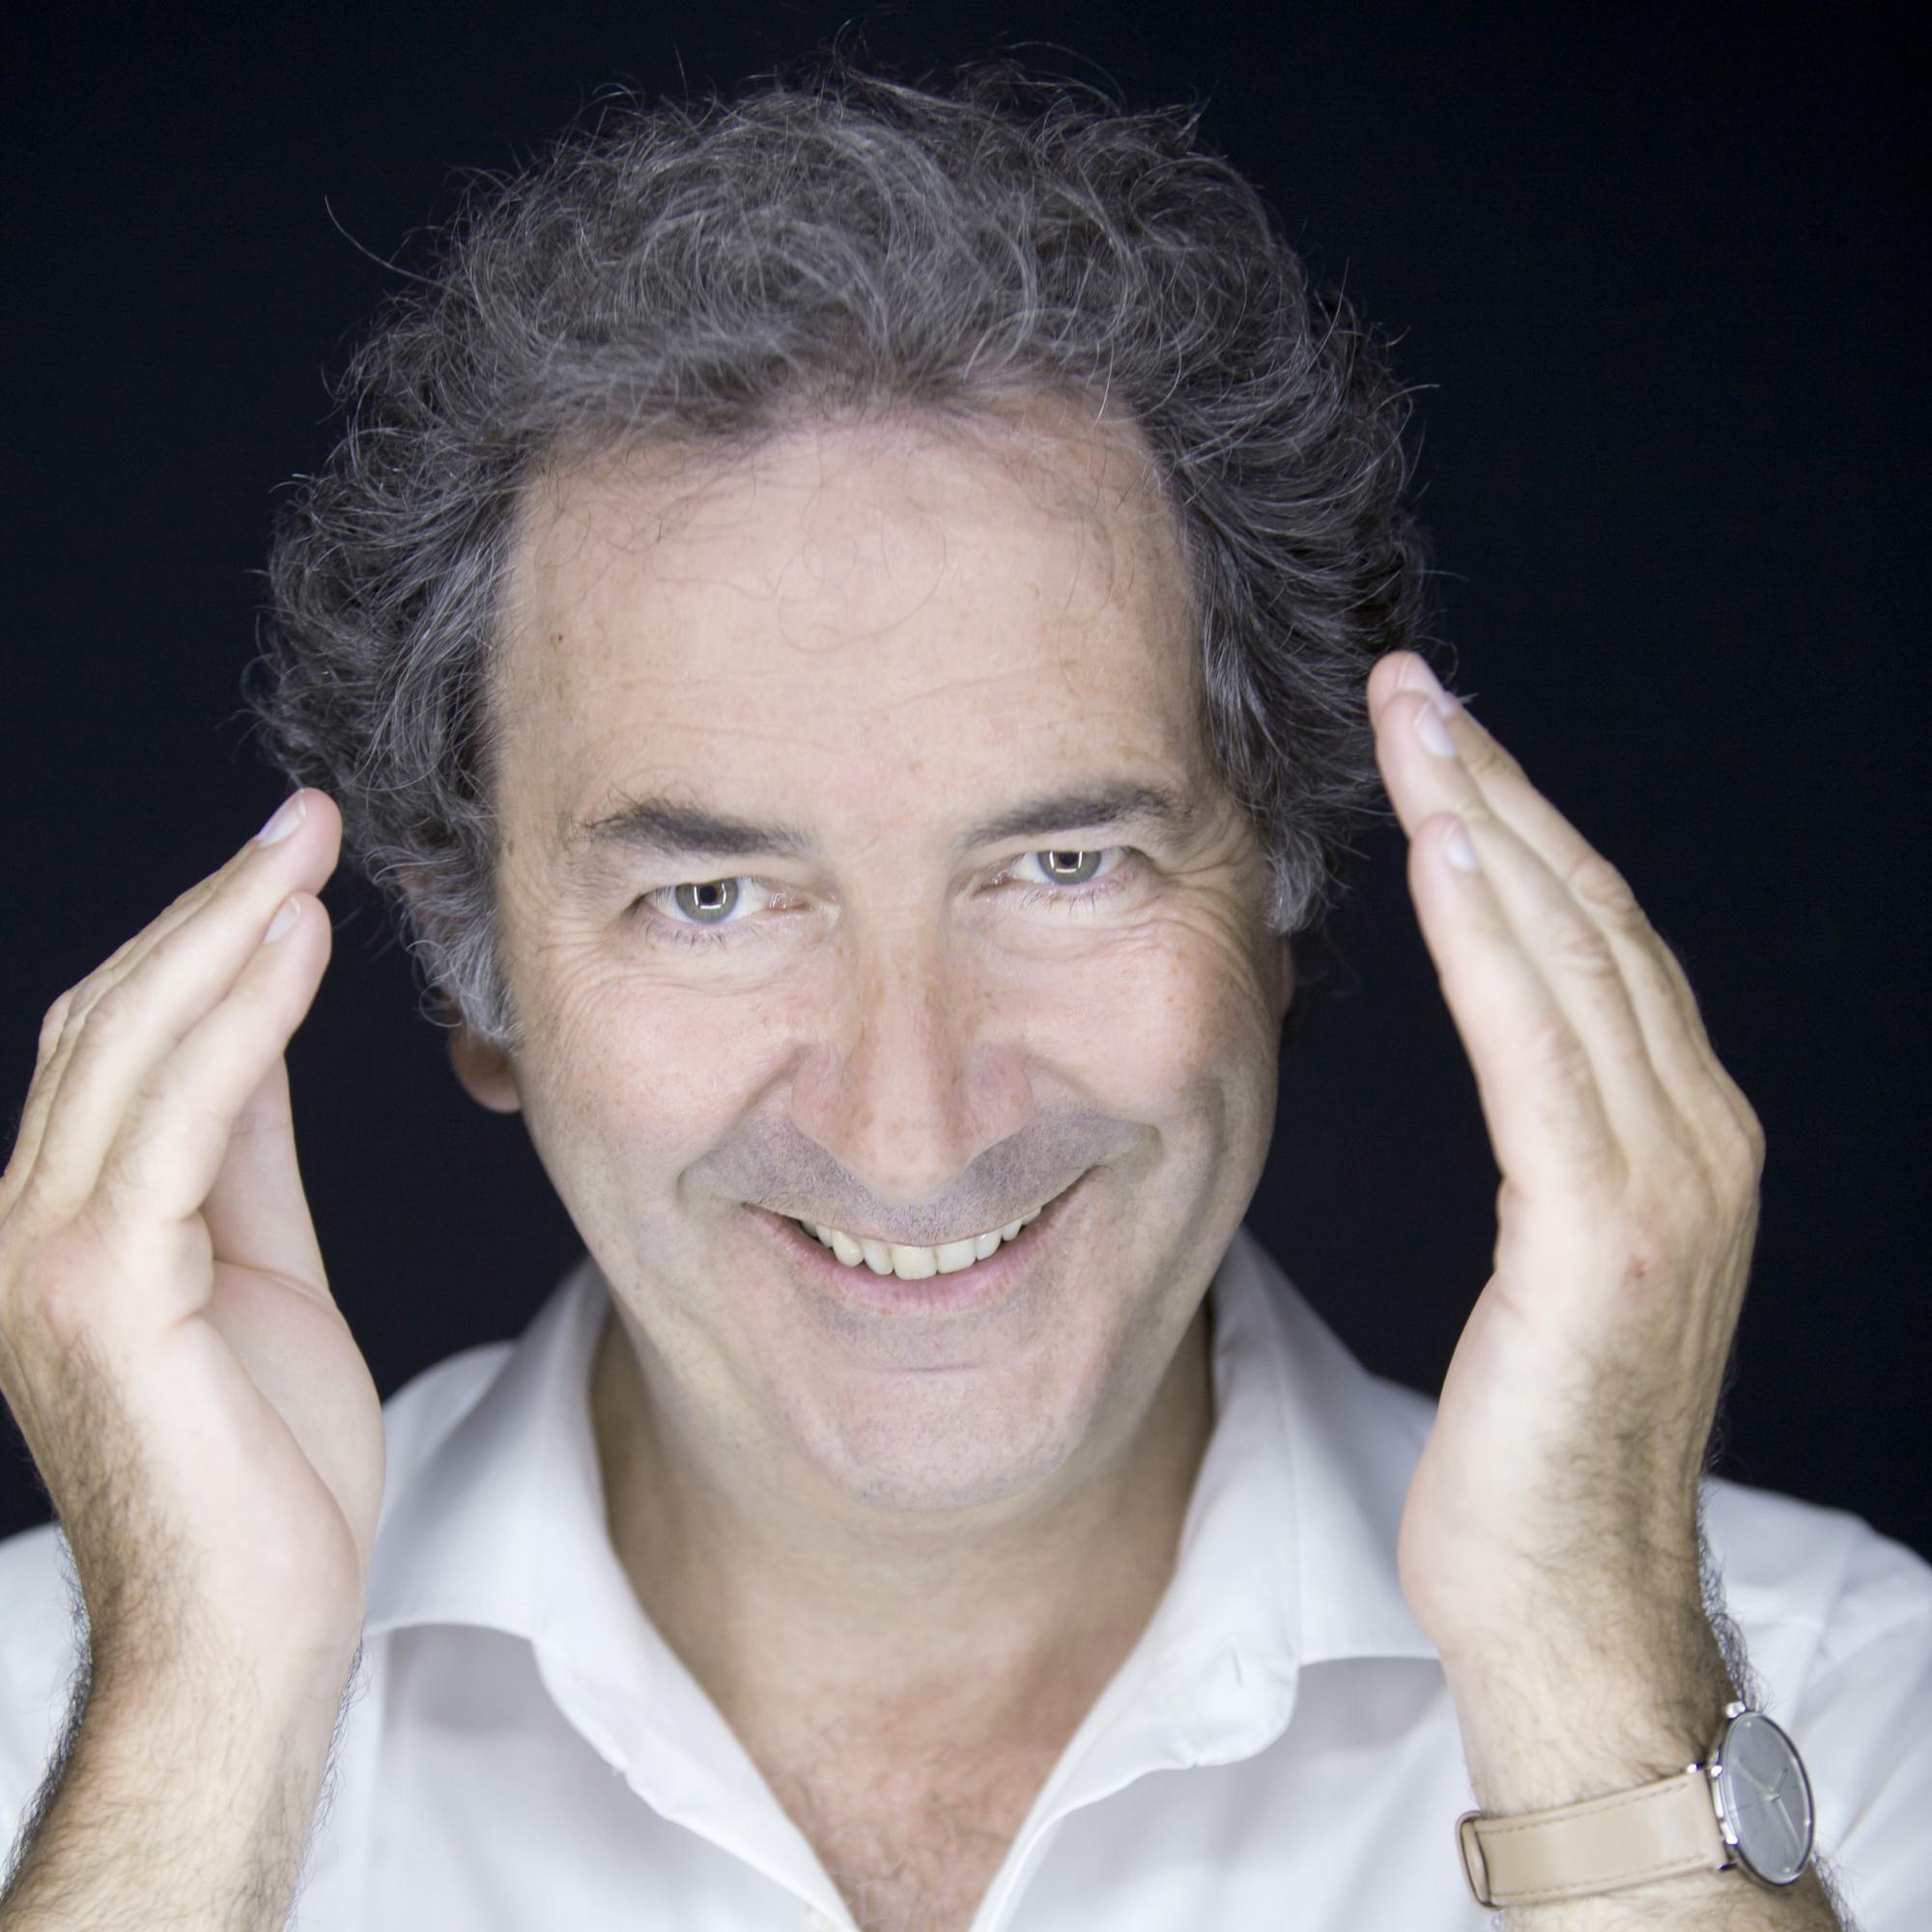 Don François Morel, le parrain - © Giovanni Cittadini Cesi